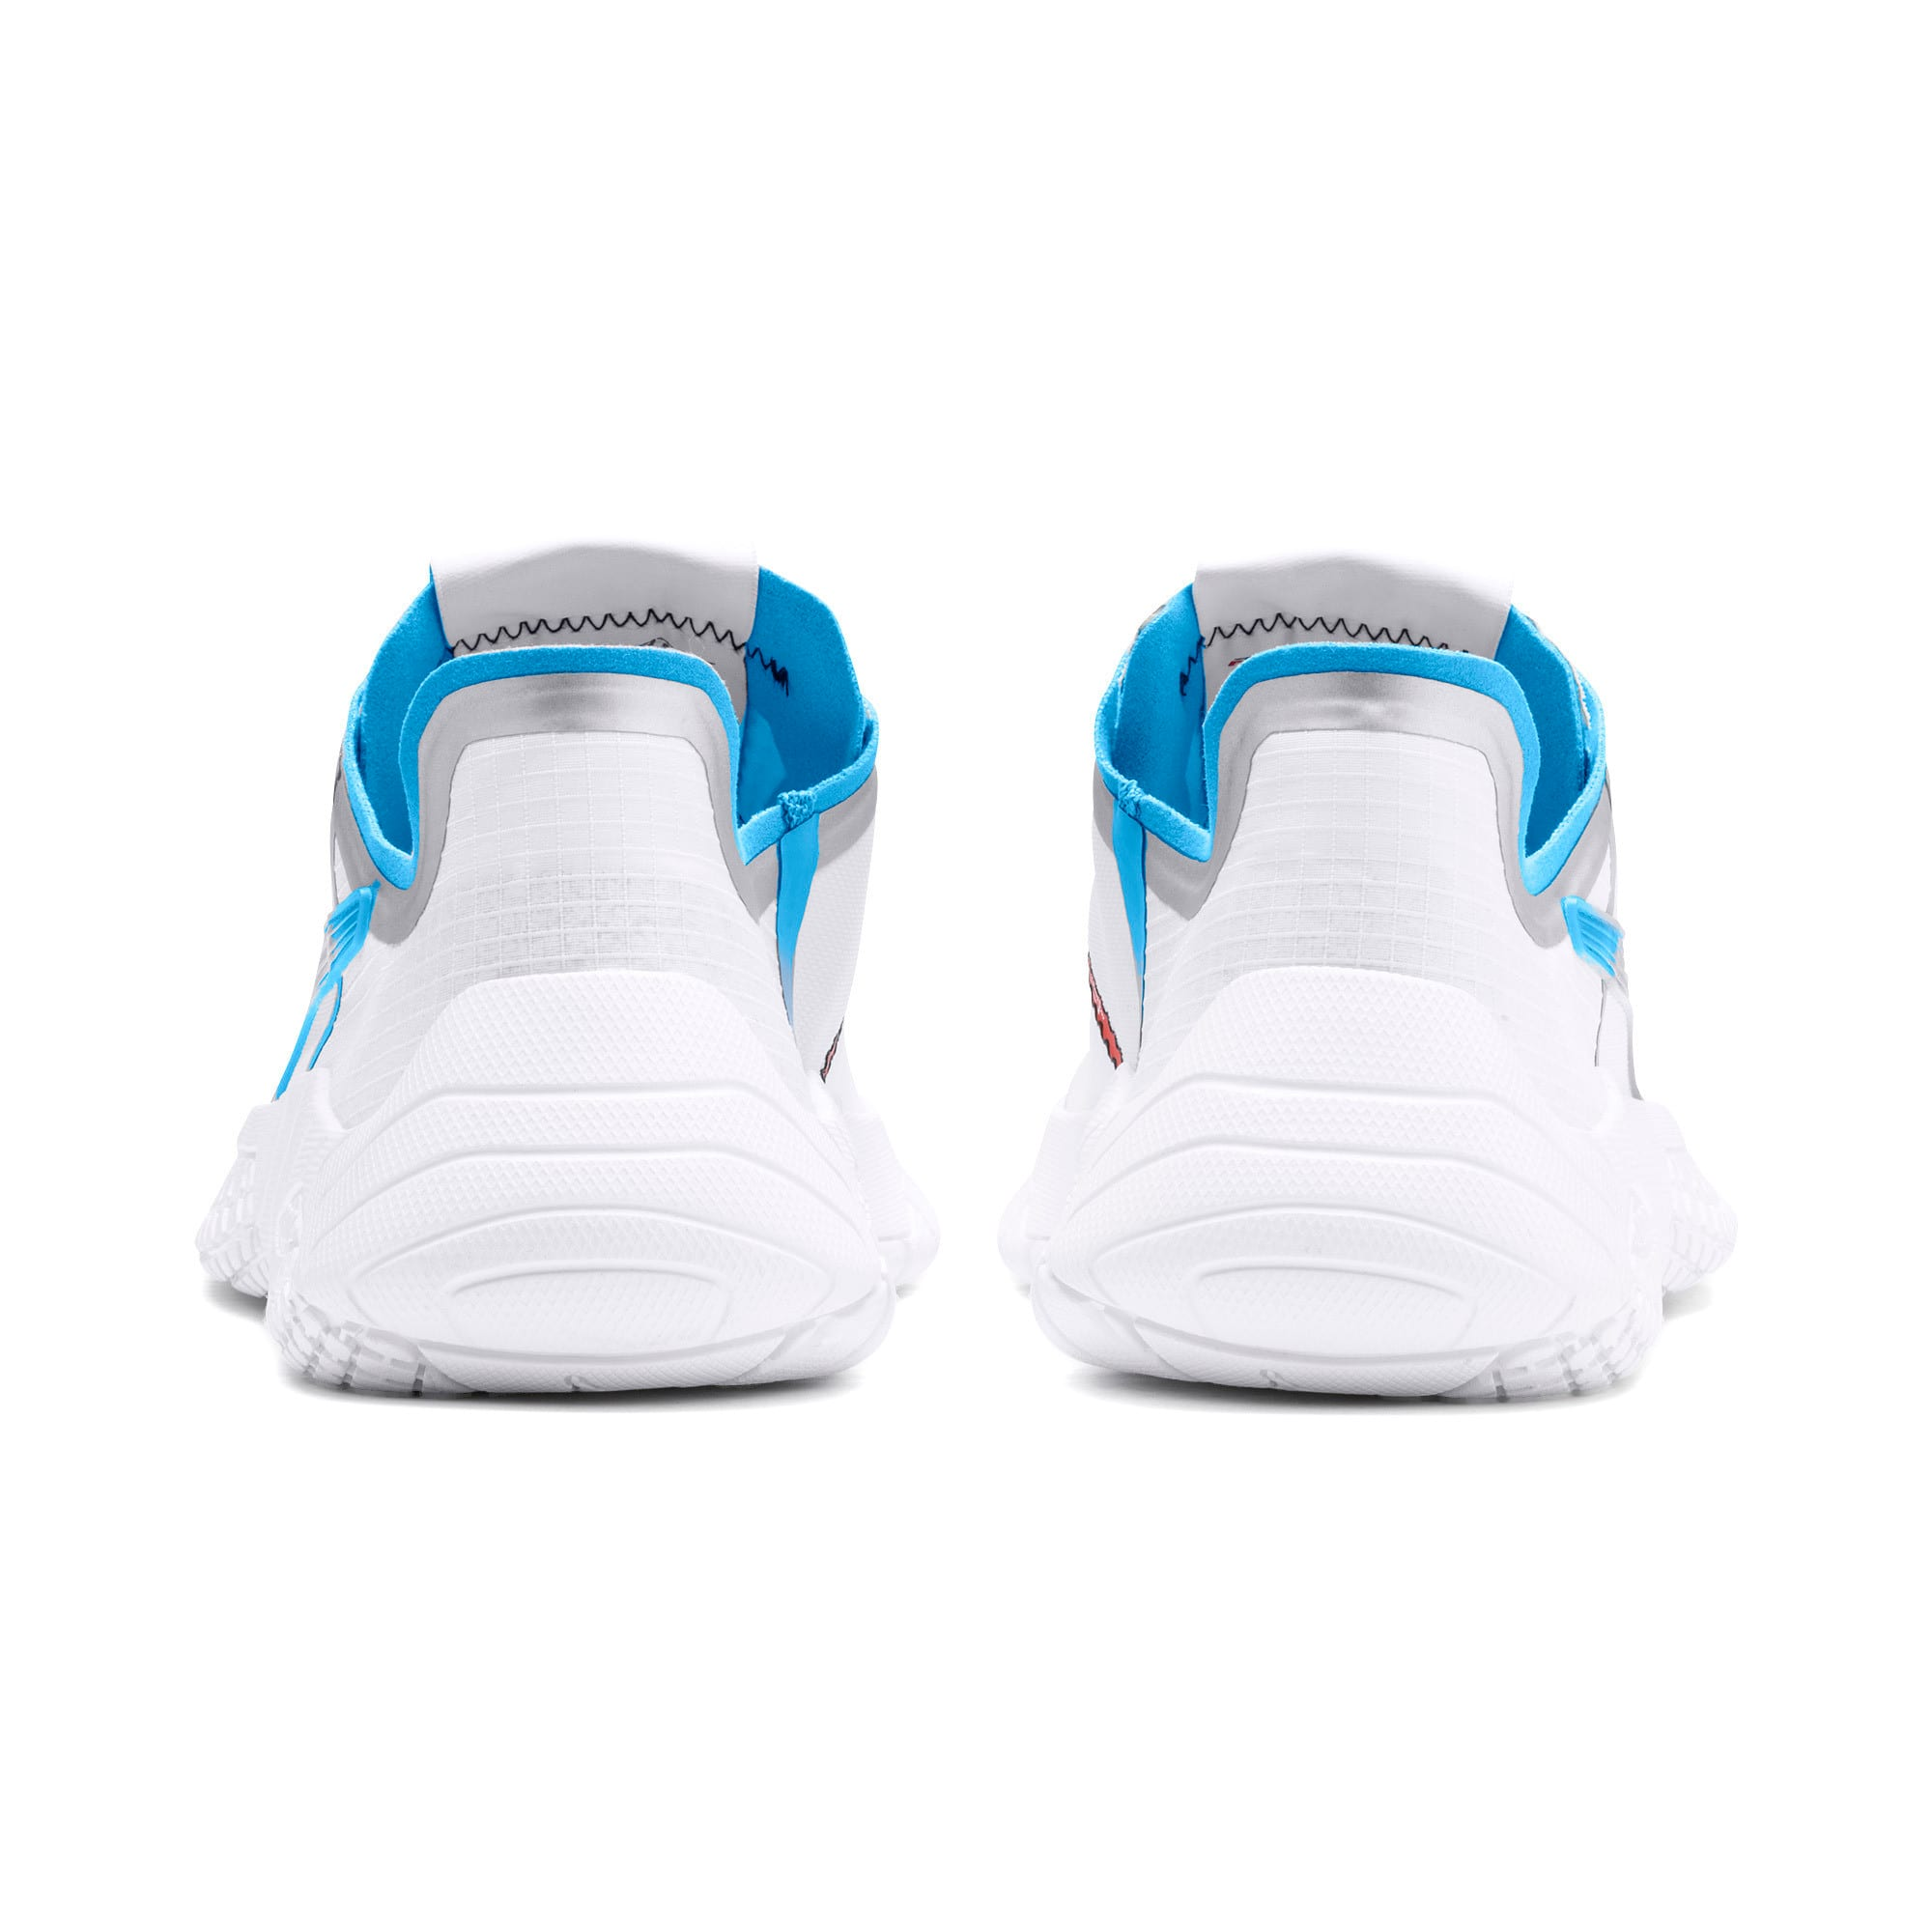 Thumbnail 4 of Pirelli Replicat-X Trainers, Puma White-AZURE BLUE, medium